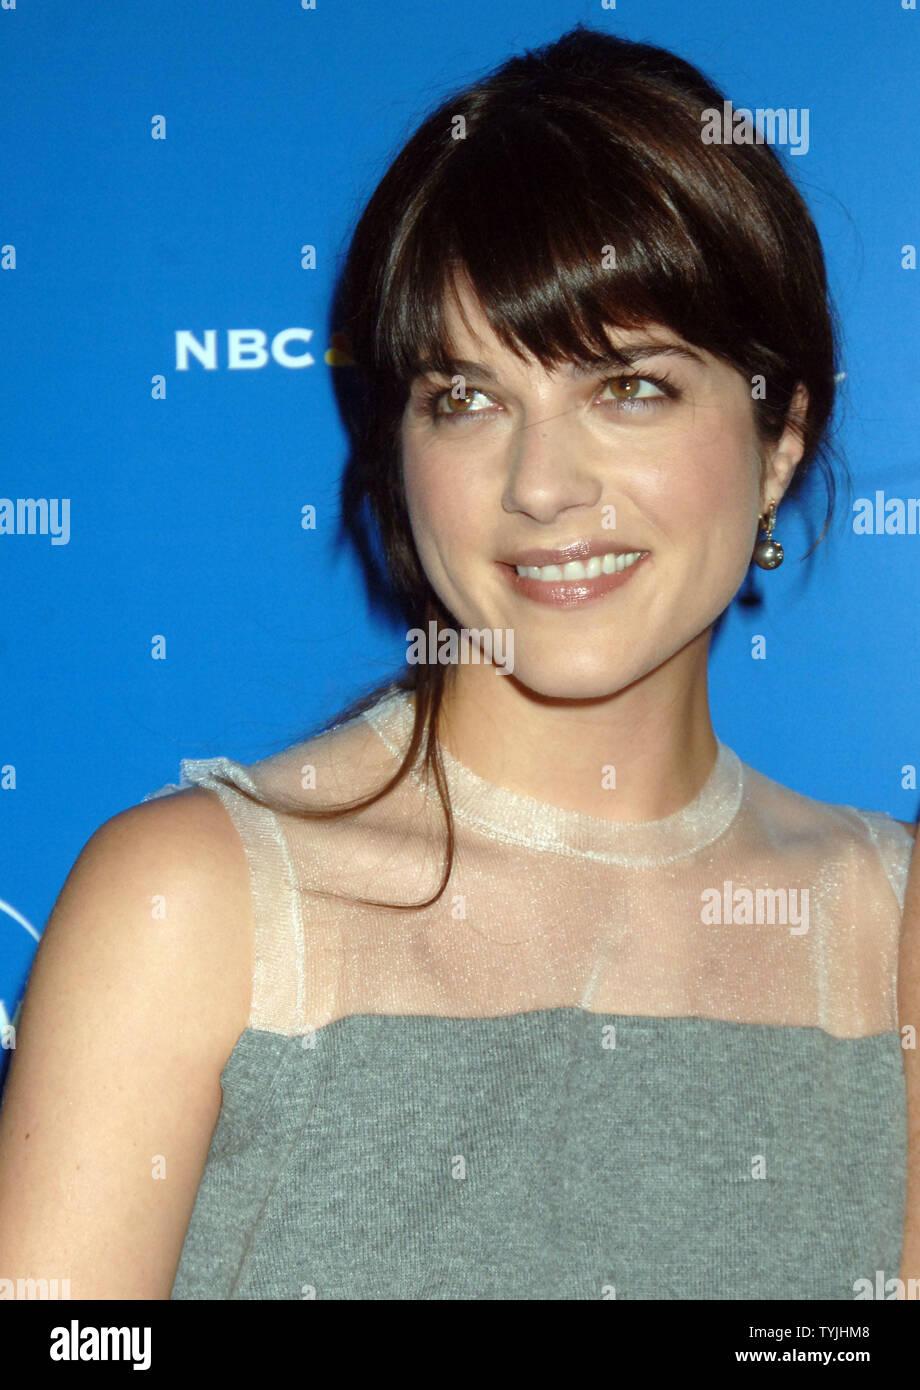 Actress Selma Blair of the tv series: Kath & Kim arrives for